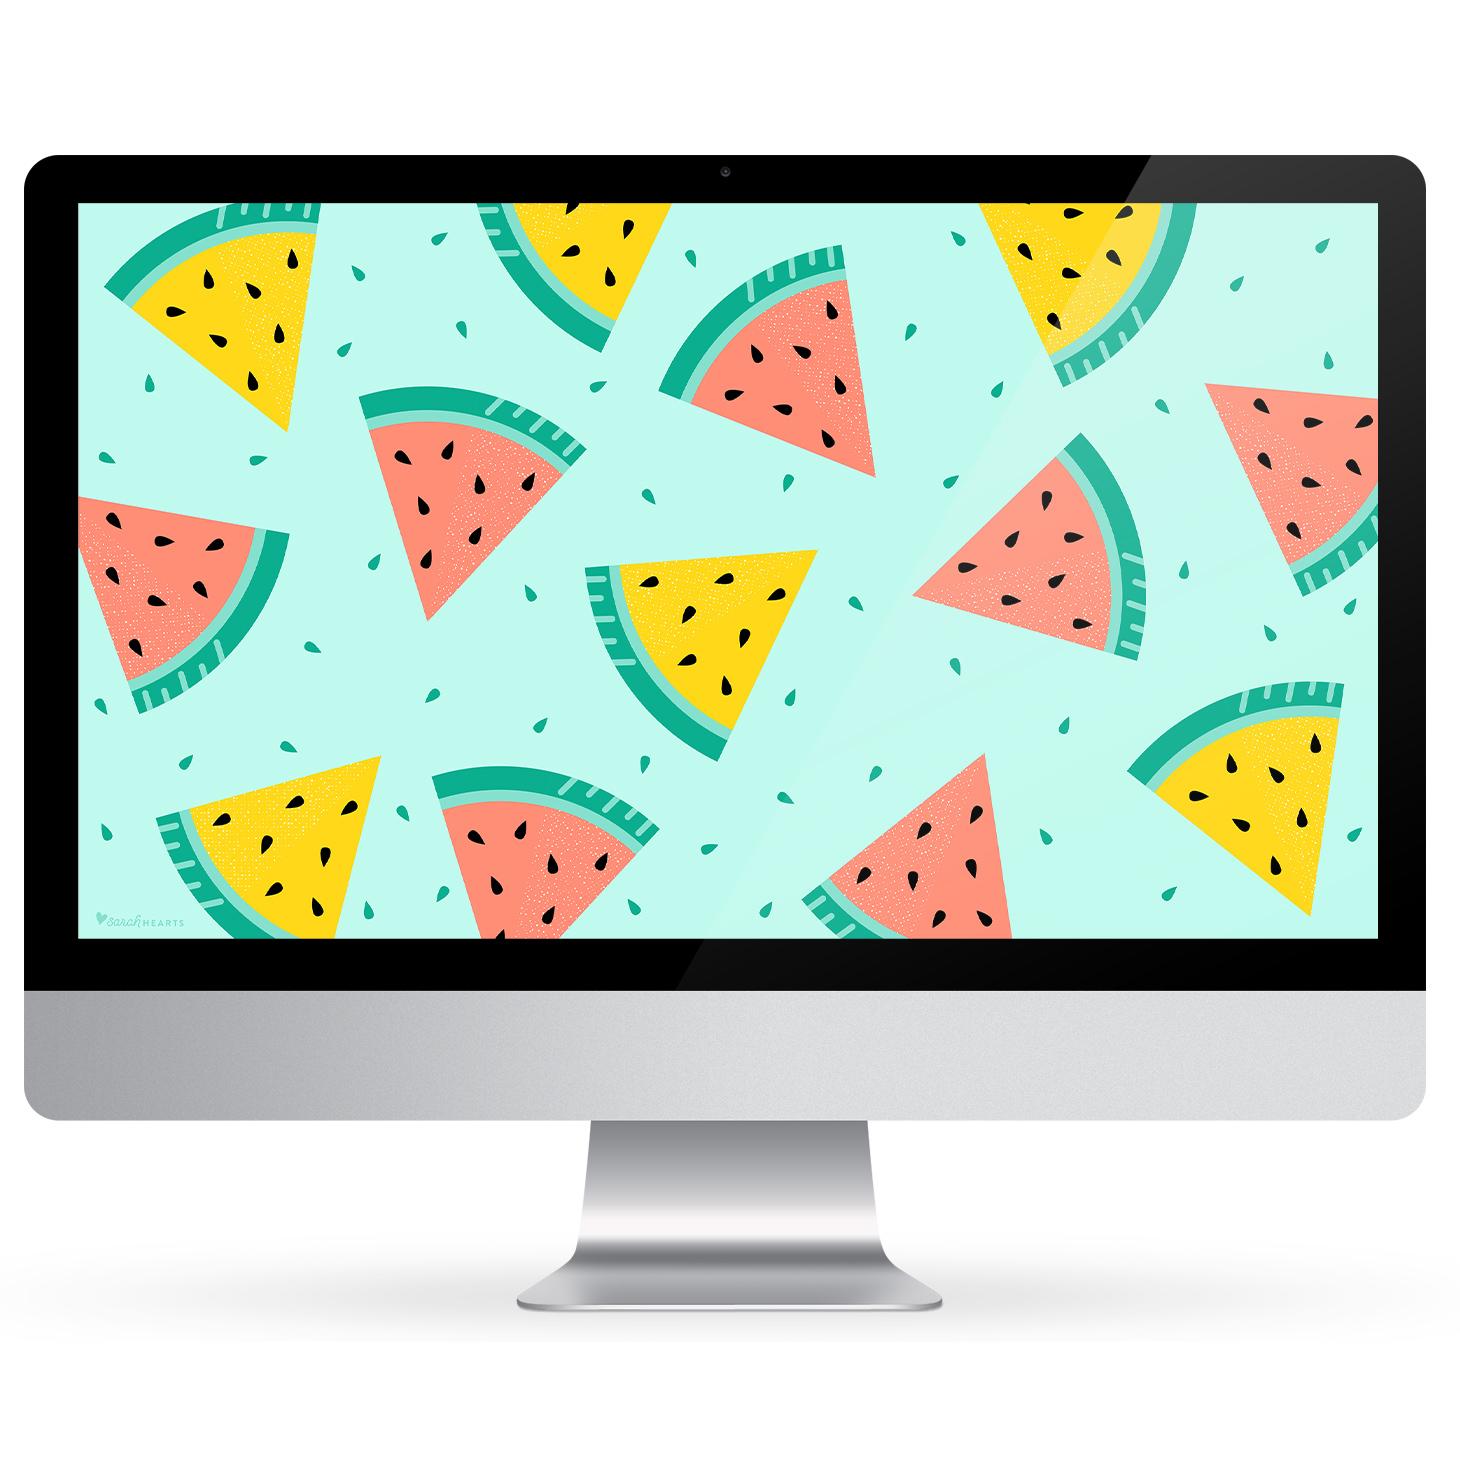 July 2018 Watermelon Calendar Wallpaper - Sarah Hearts